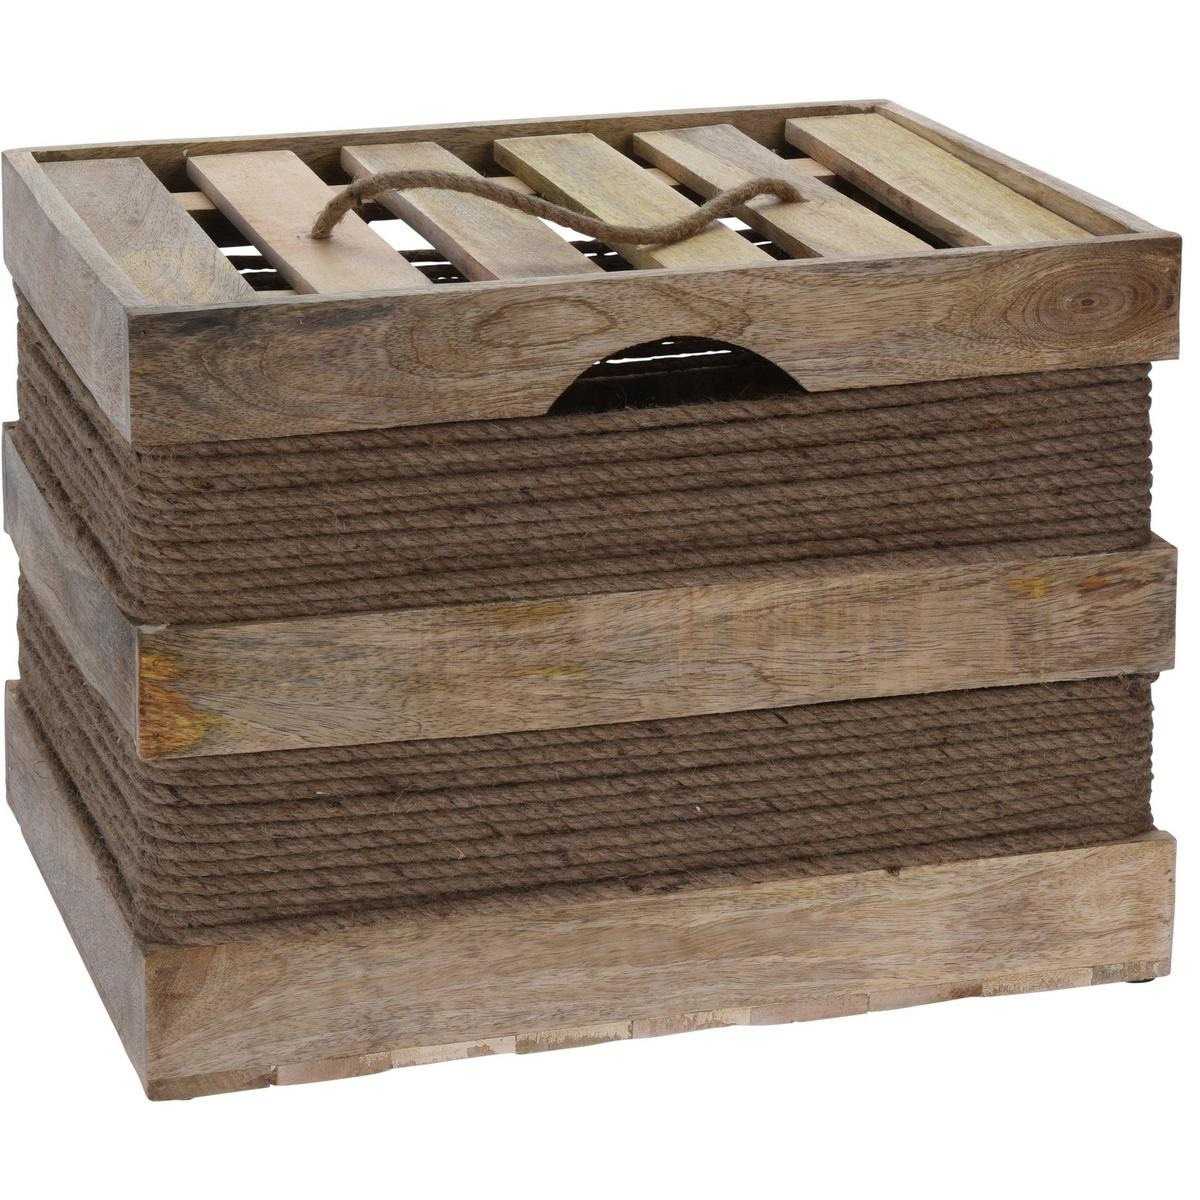 Koopman Sada dekoračných drevených boxov Mango wood, 2 ks